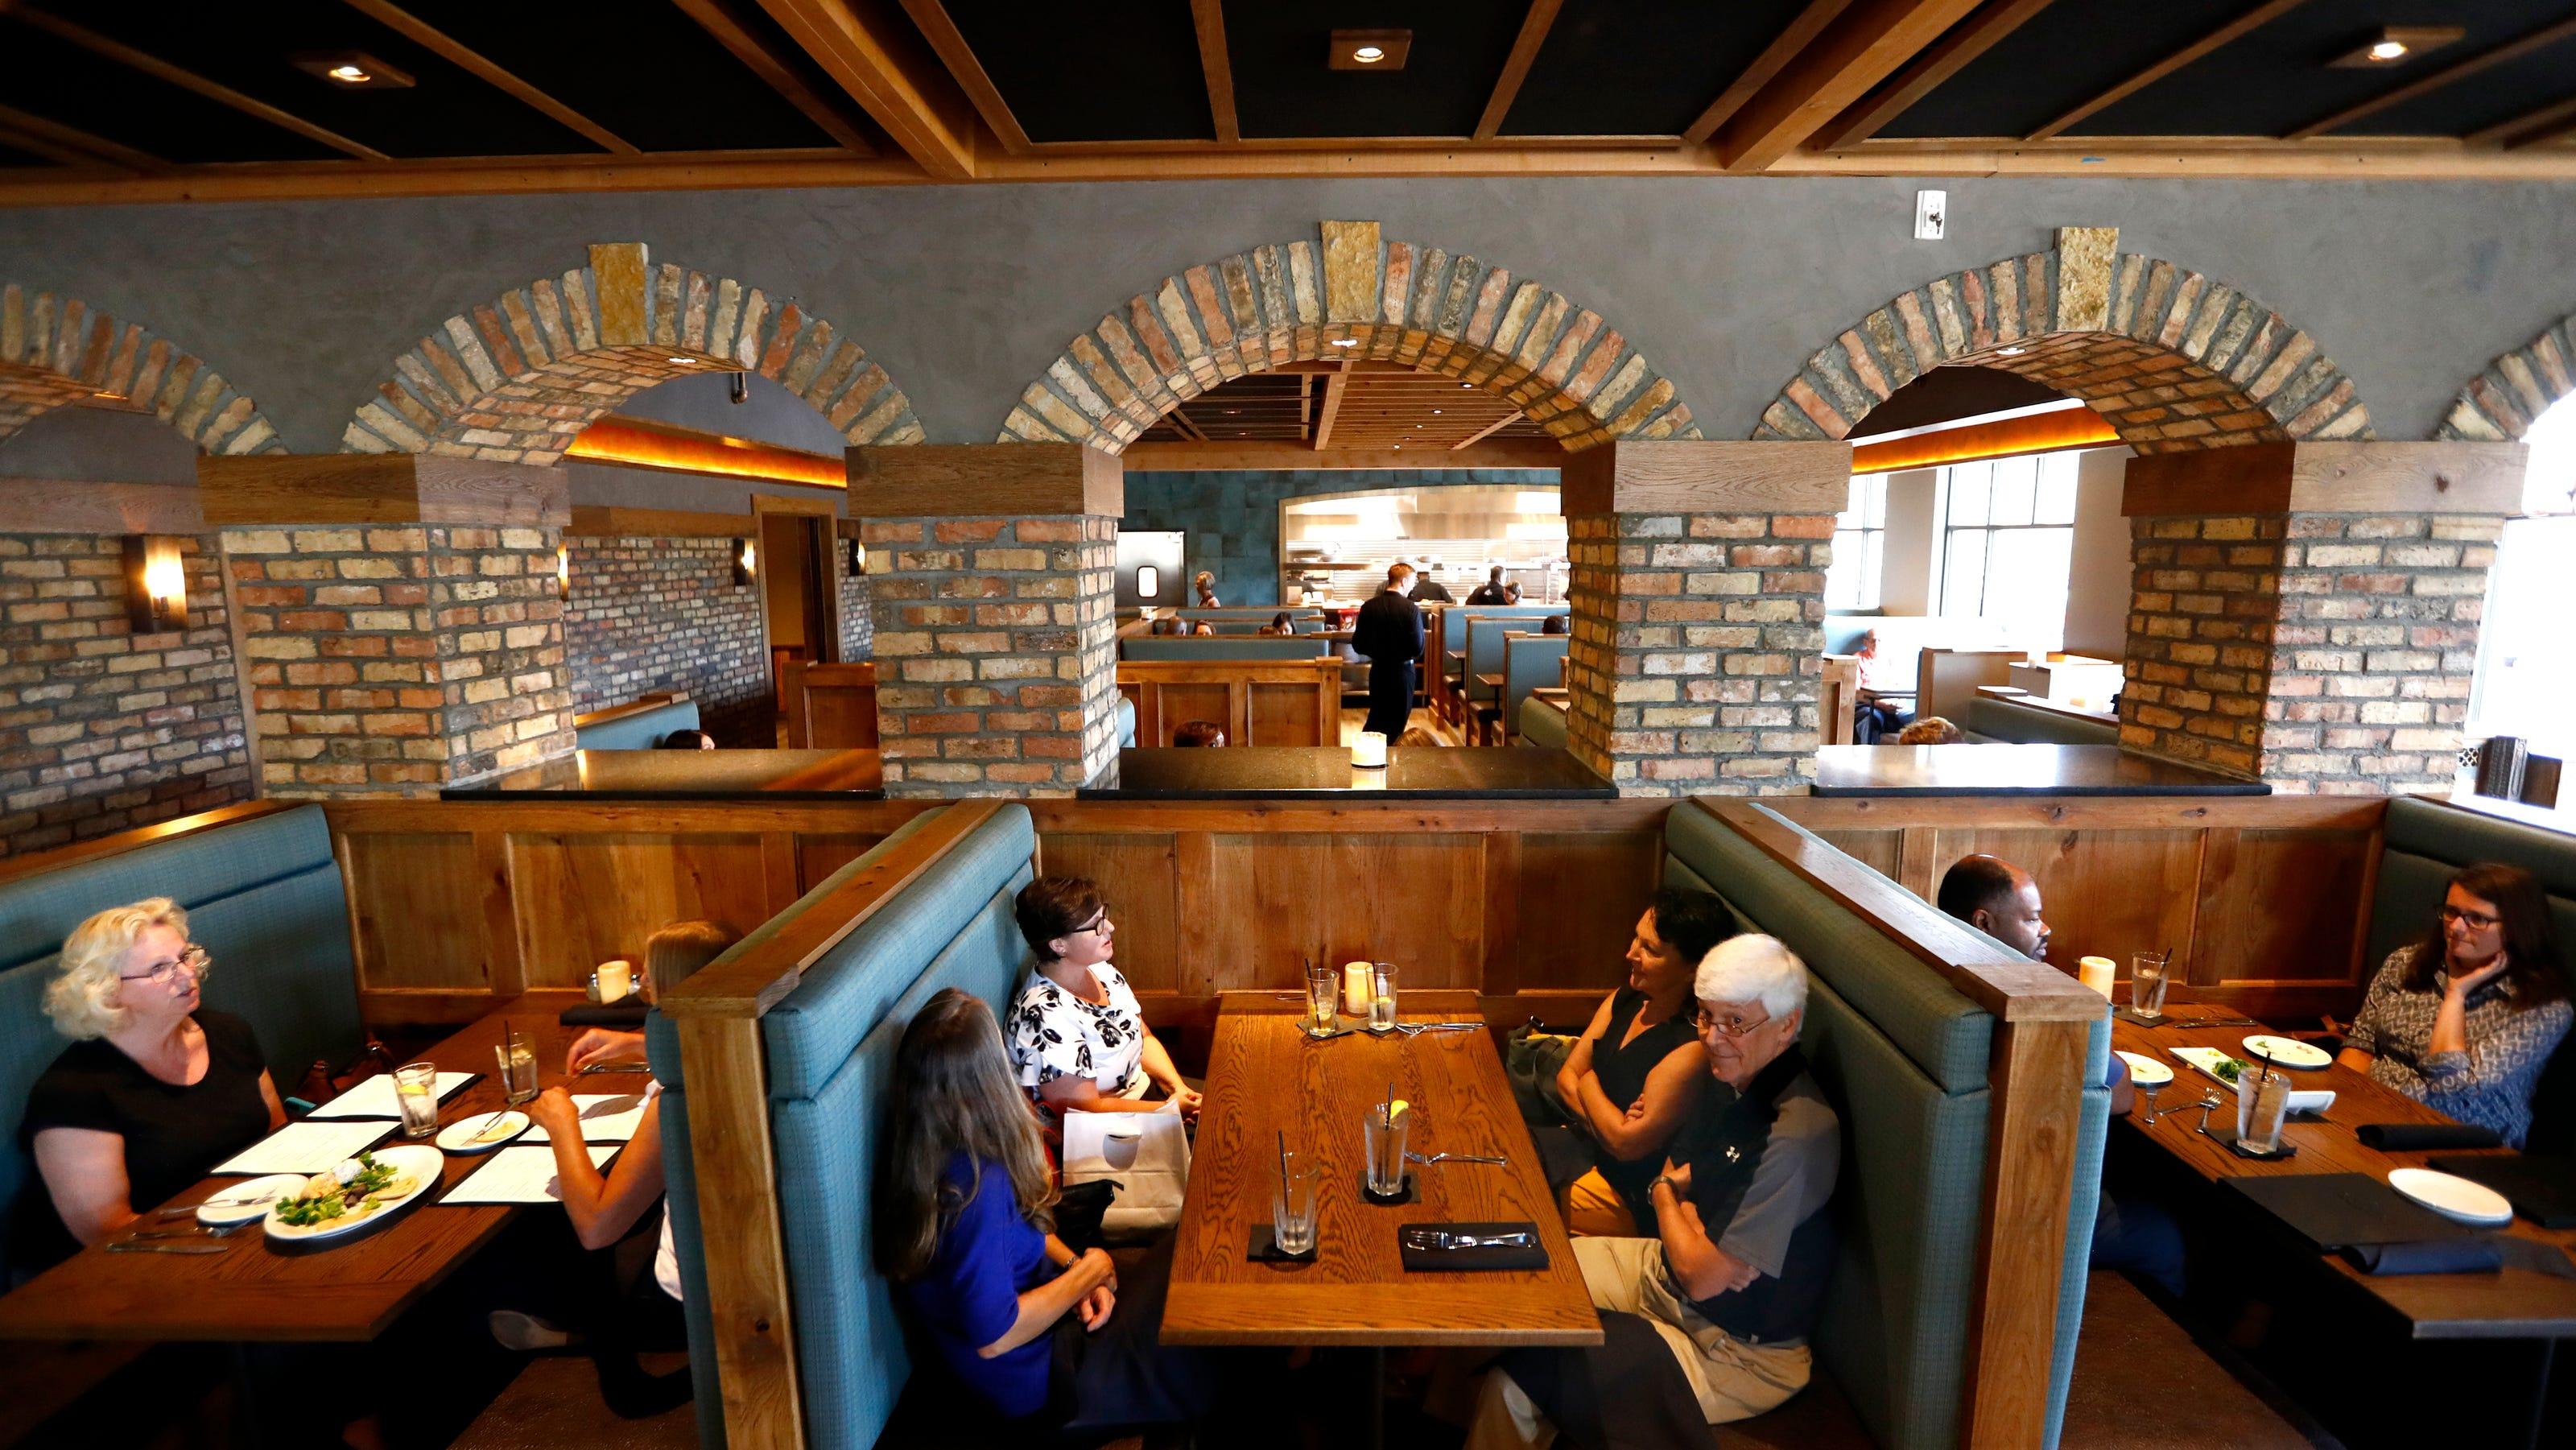 Memphis Restaurants Open On Christmas Day 2021 Memphis Restaurants That Will Be Open On Christmas Day